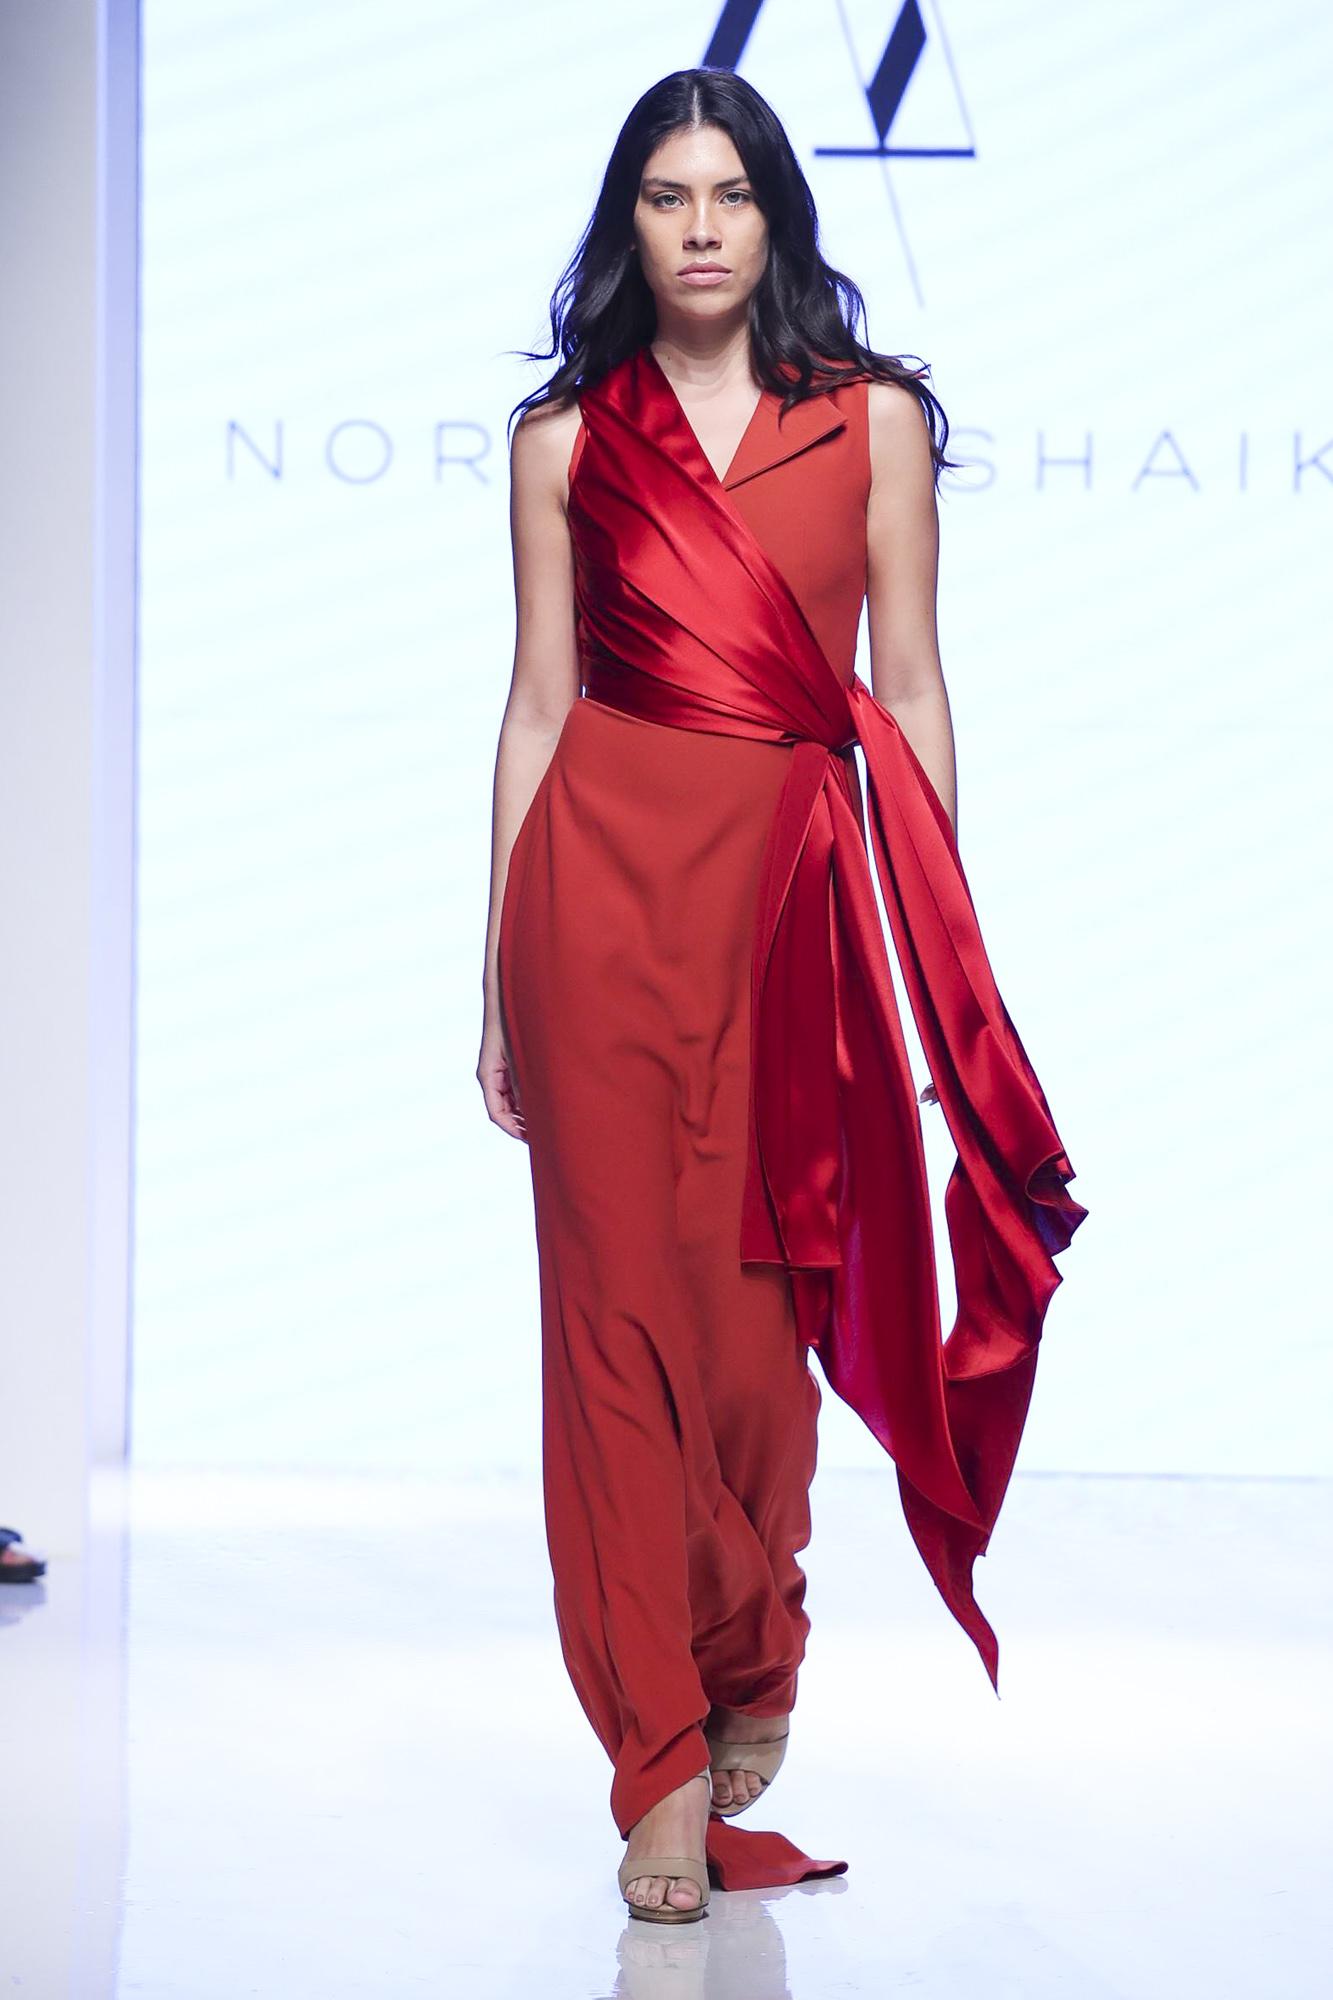 Nora Al Shaikh fashion show, Arab Fashion Week collection Spring Summer 2020 in Dubai